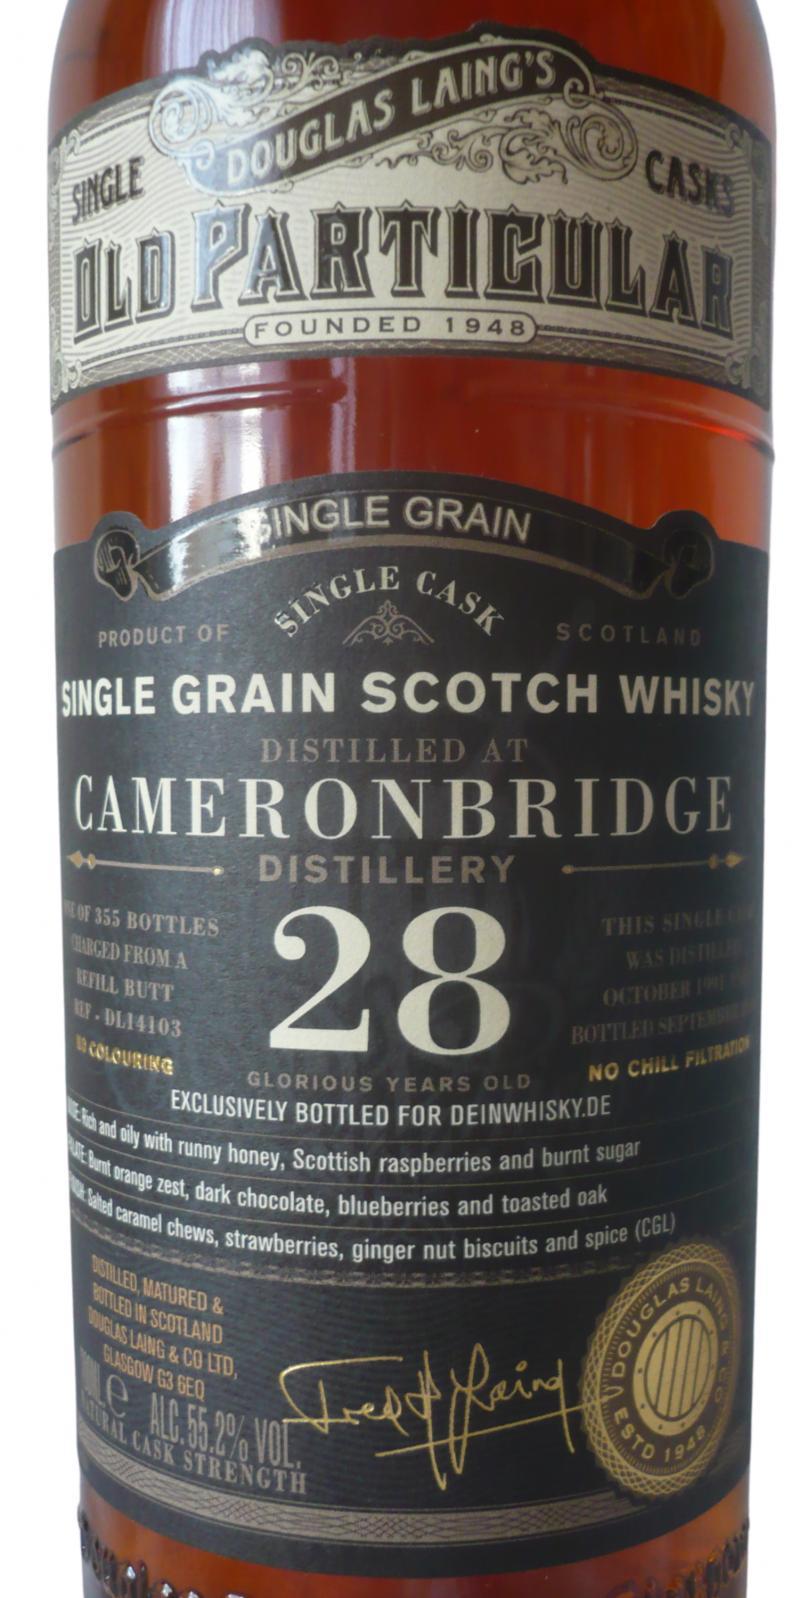 Cameronbridge 1991 DL